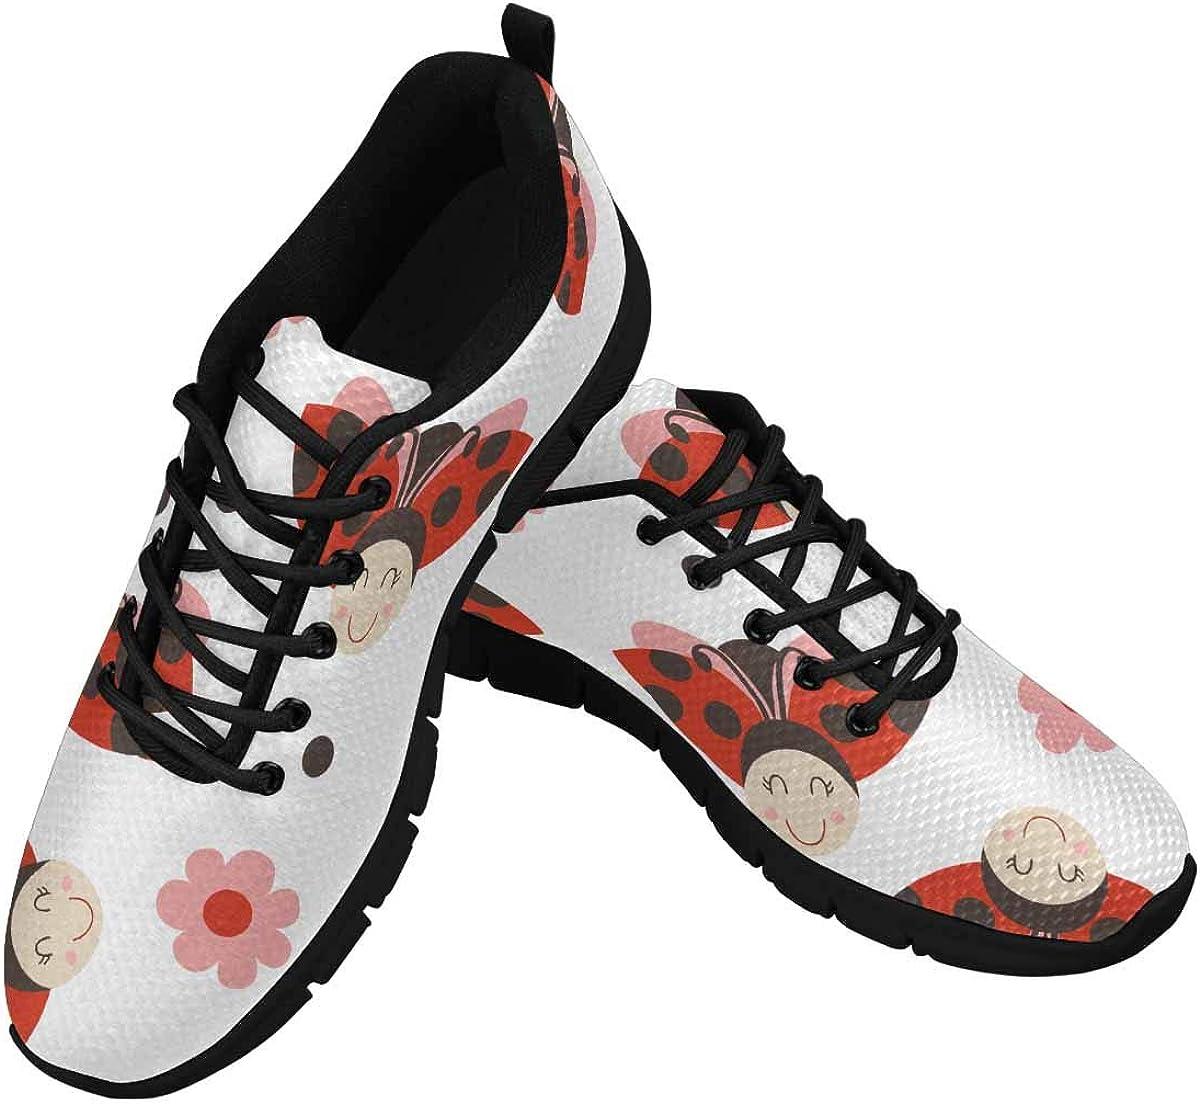 INTERESTPRINT Pattern with Funny Ladybug Women's Athletic Walking Shoes Breathe Comfort Mesh